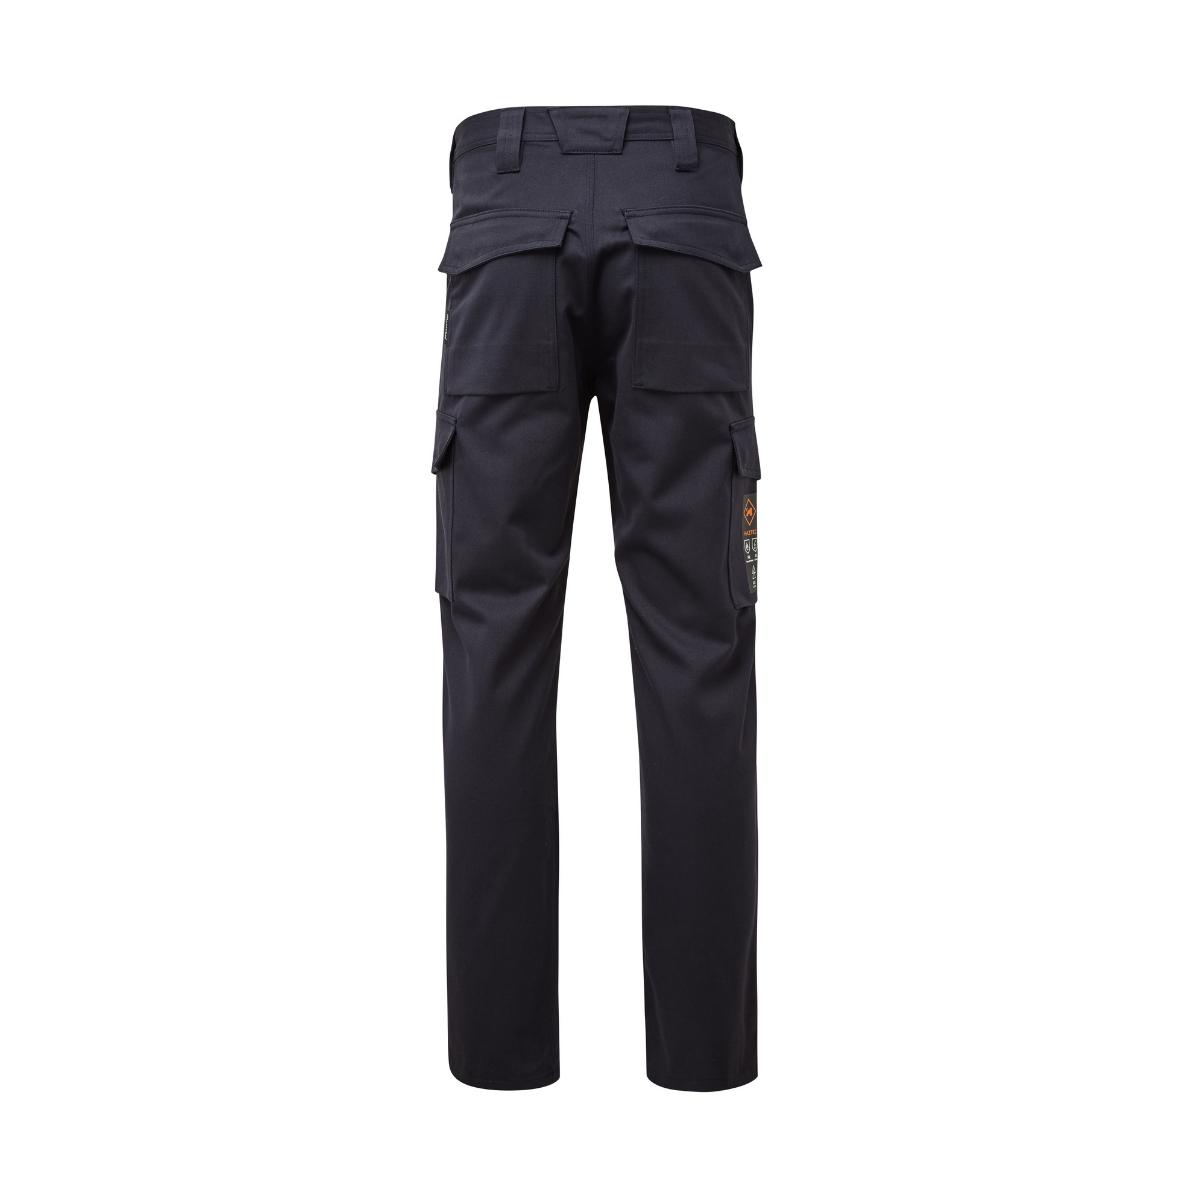 AS0062_HAZTEC® Kuito FR AS ARC Combat Trouser_Back